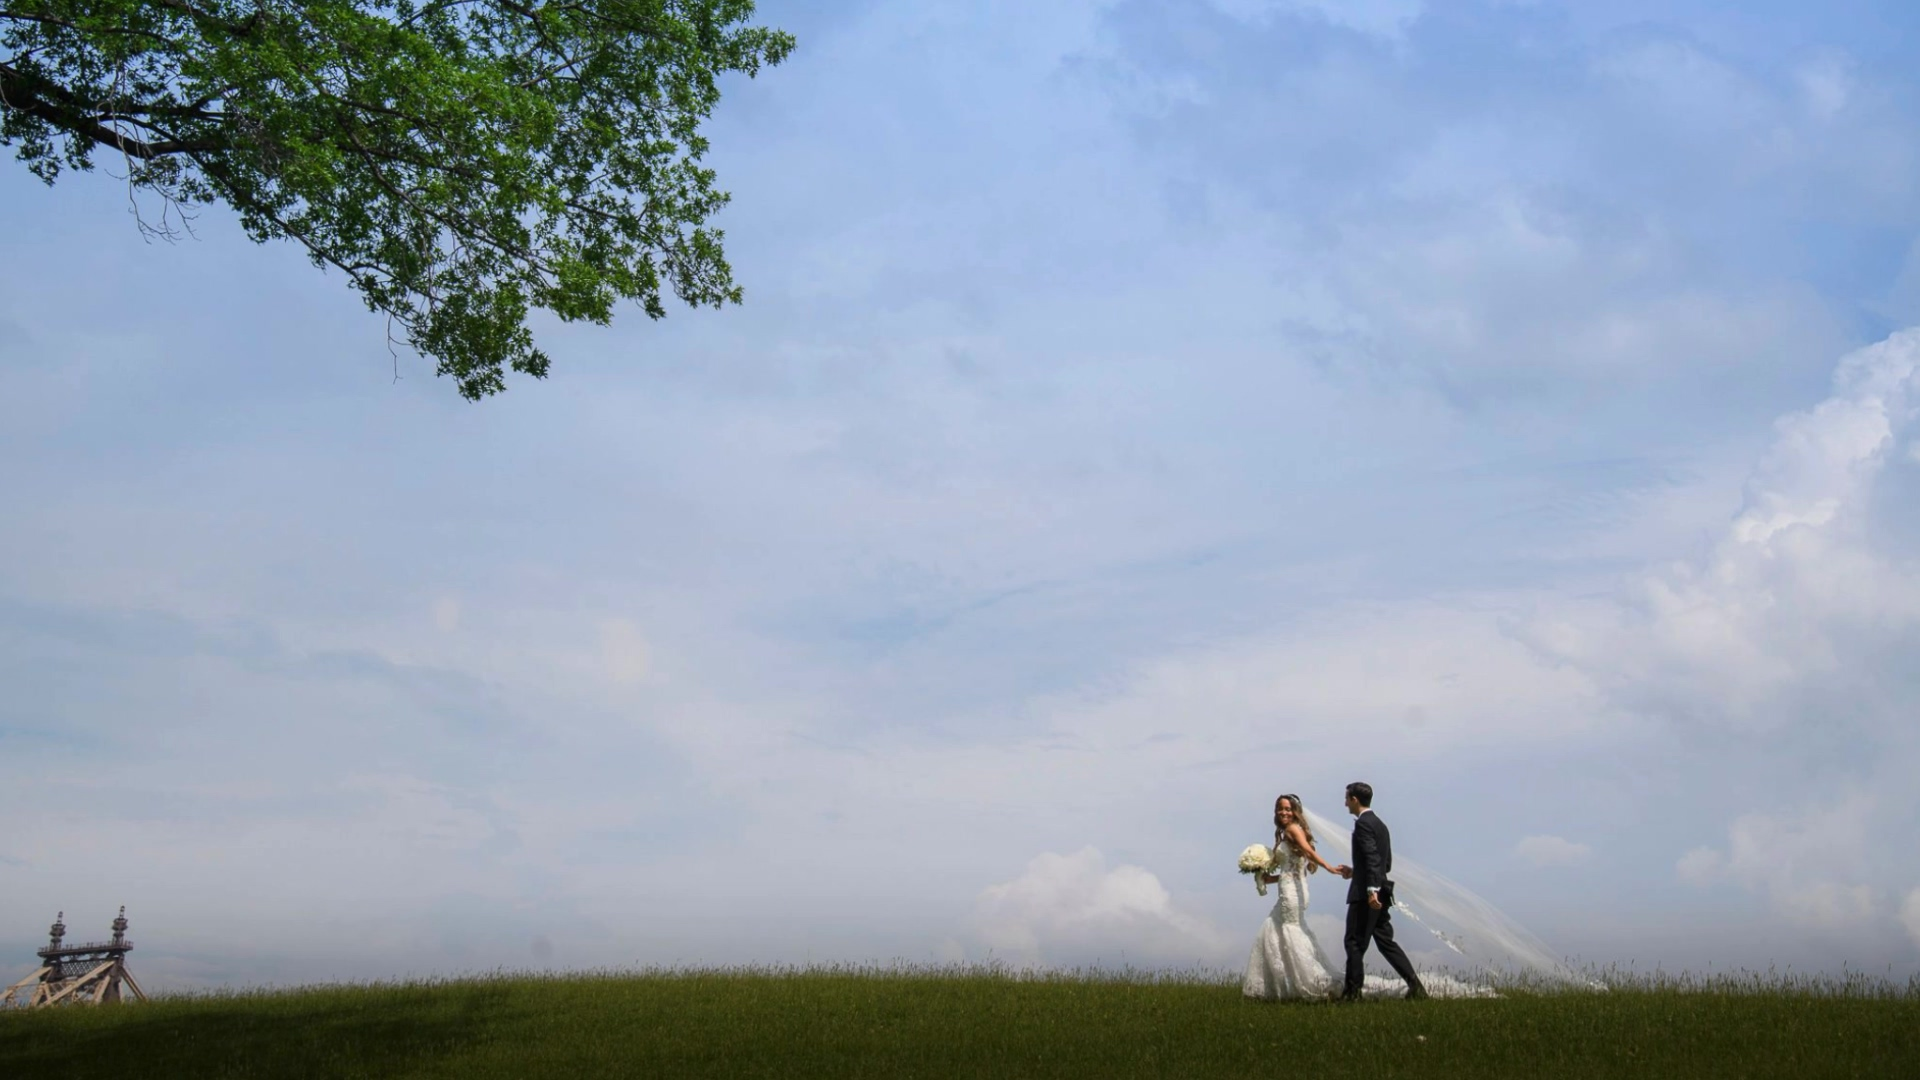 2020_Wedding_Photos_at_Roosevelt_Island_1080p